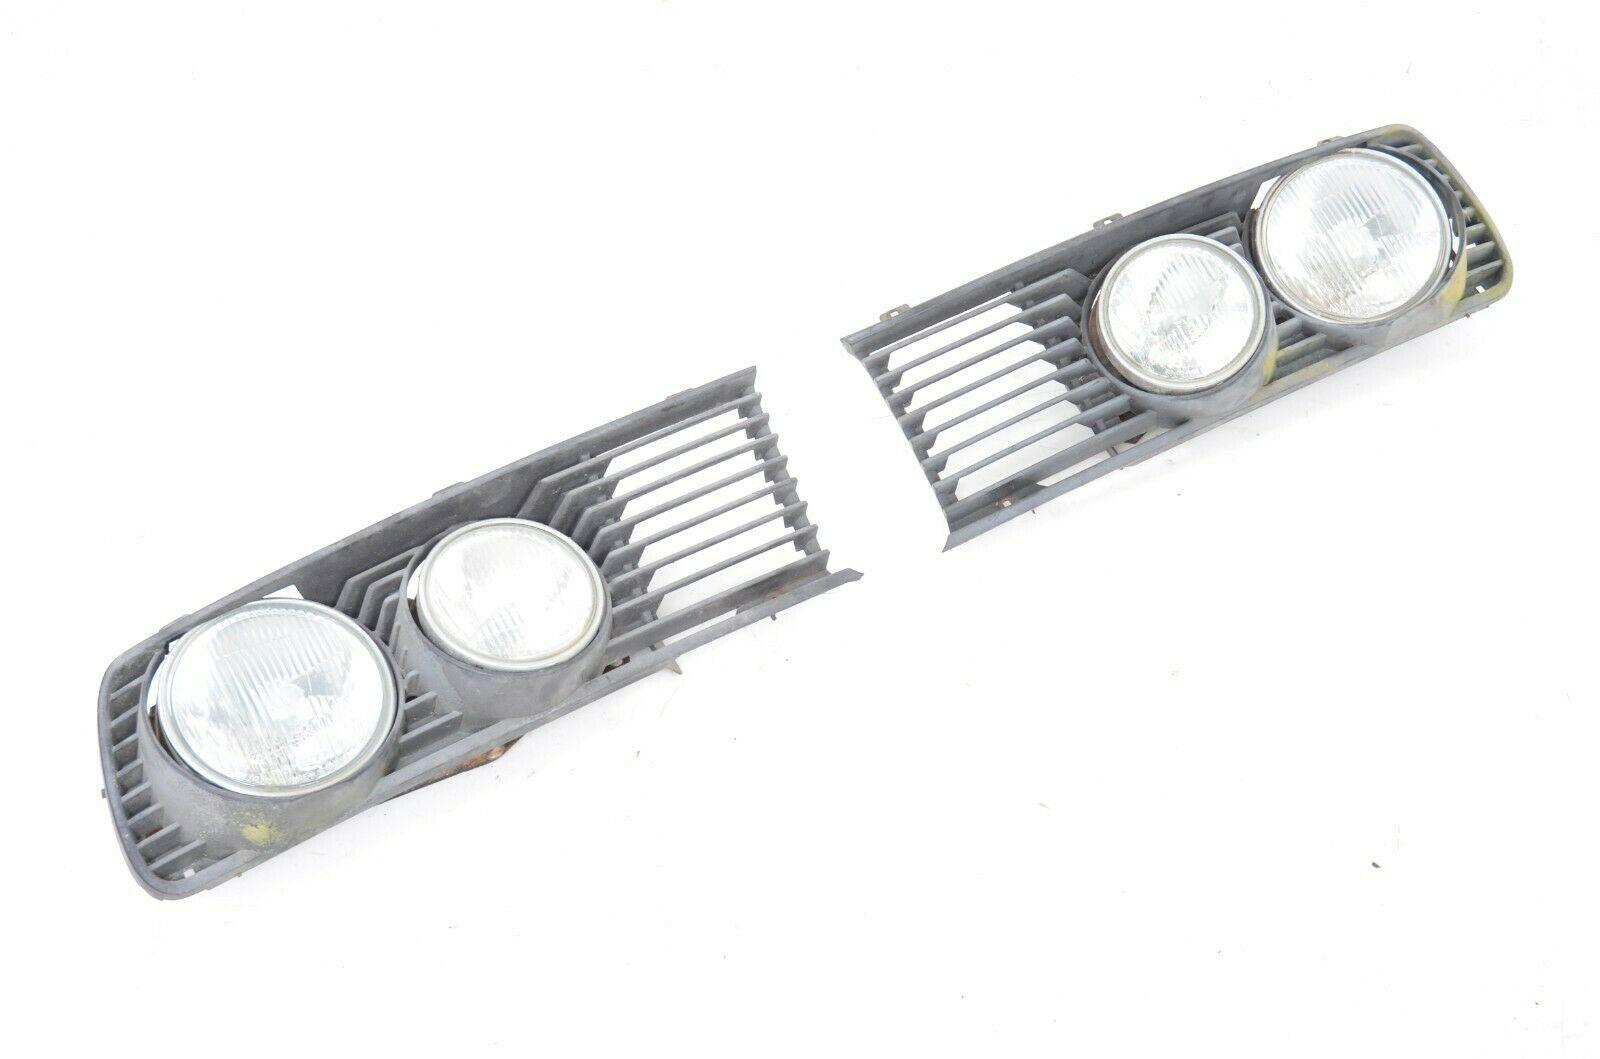 Euro headlight & grill conversion set for E28 Original